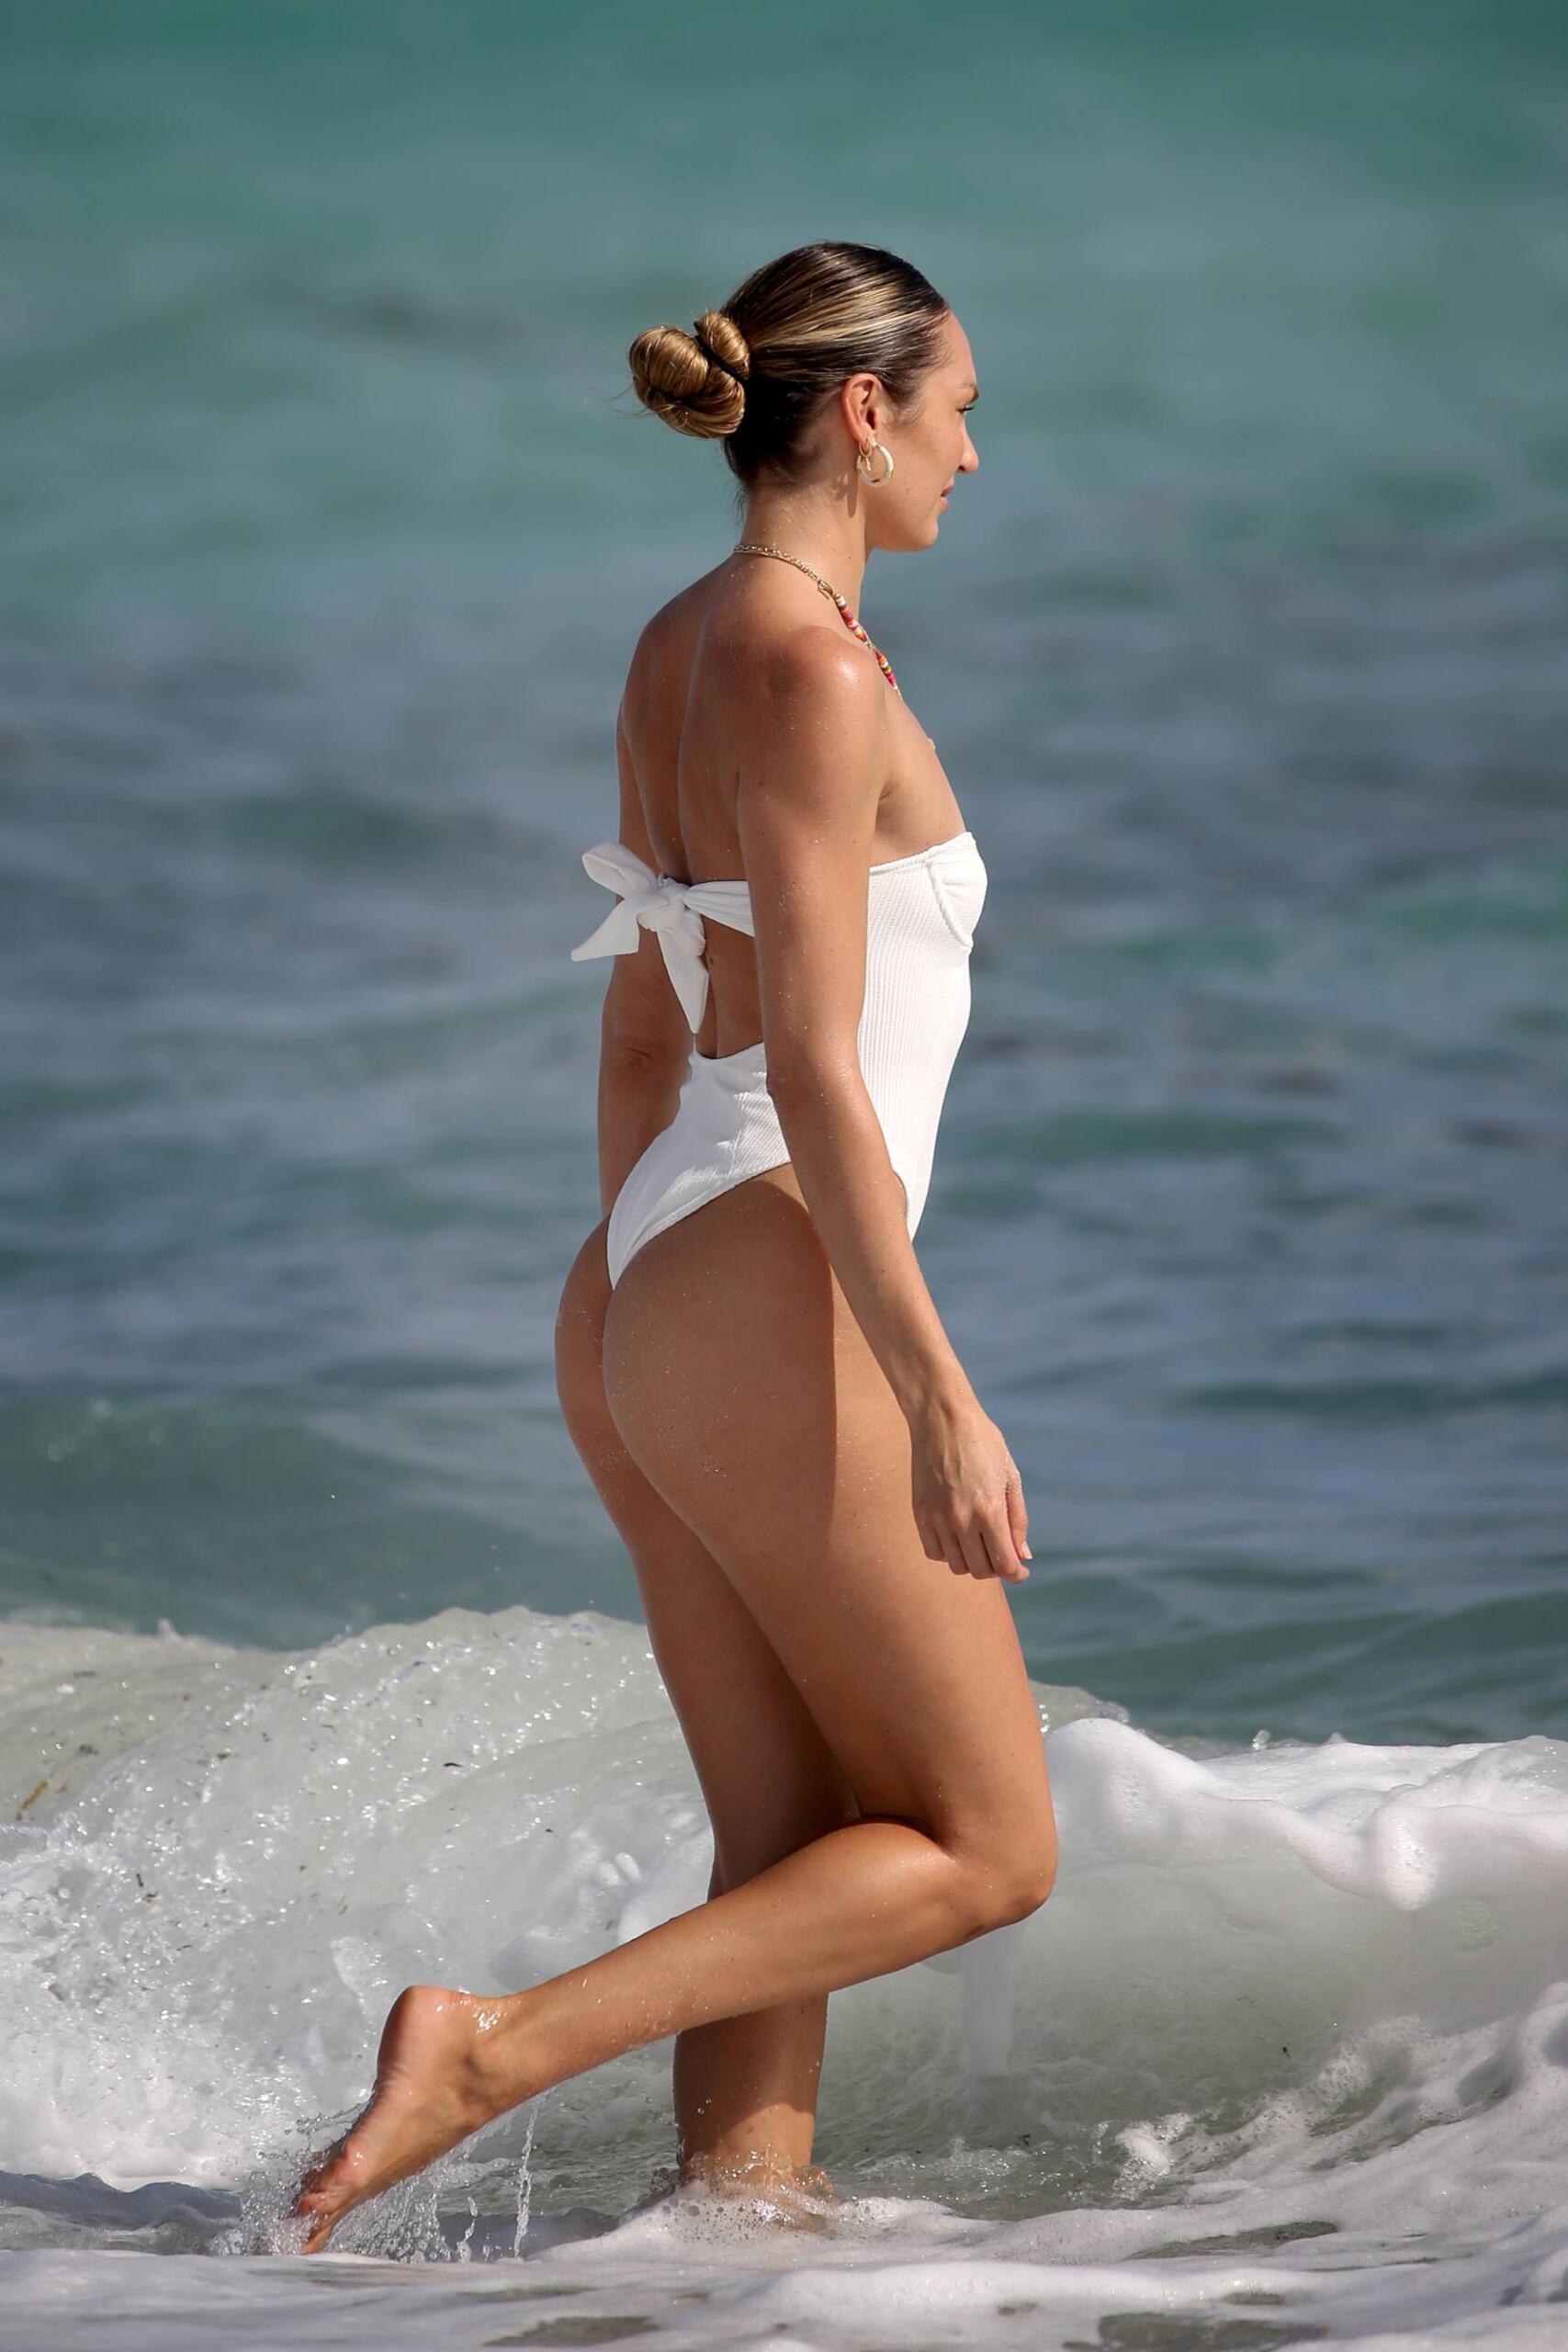 Candice Swanepoel In Swimsuit